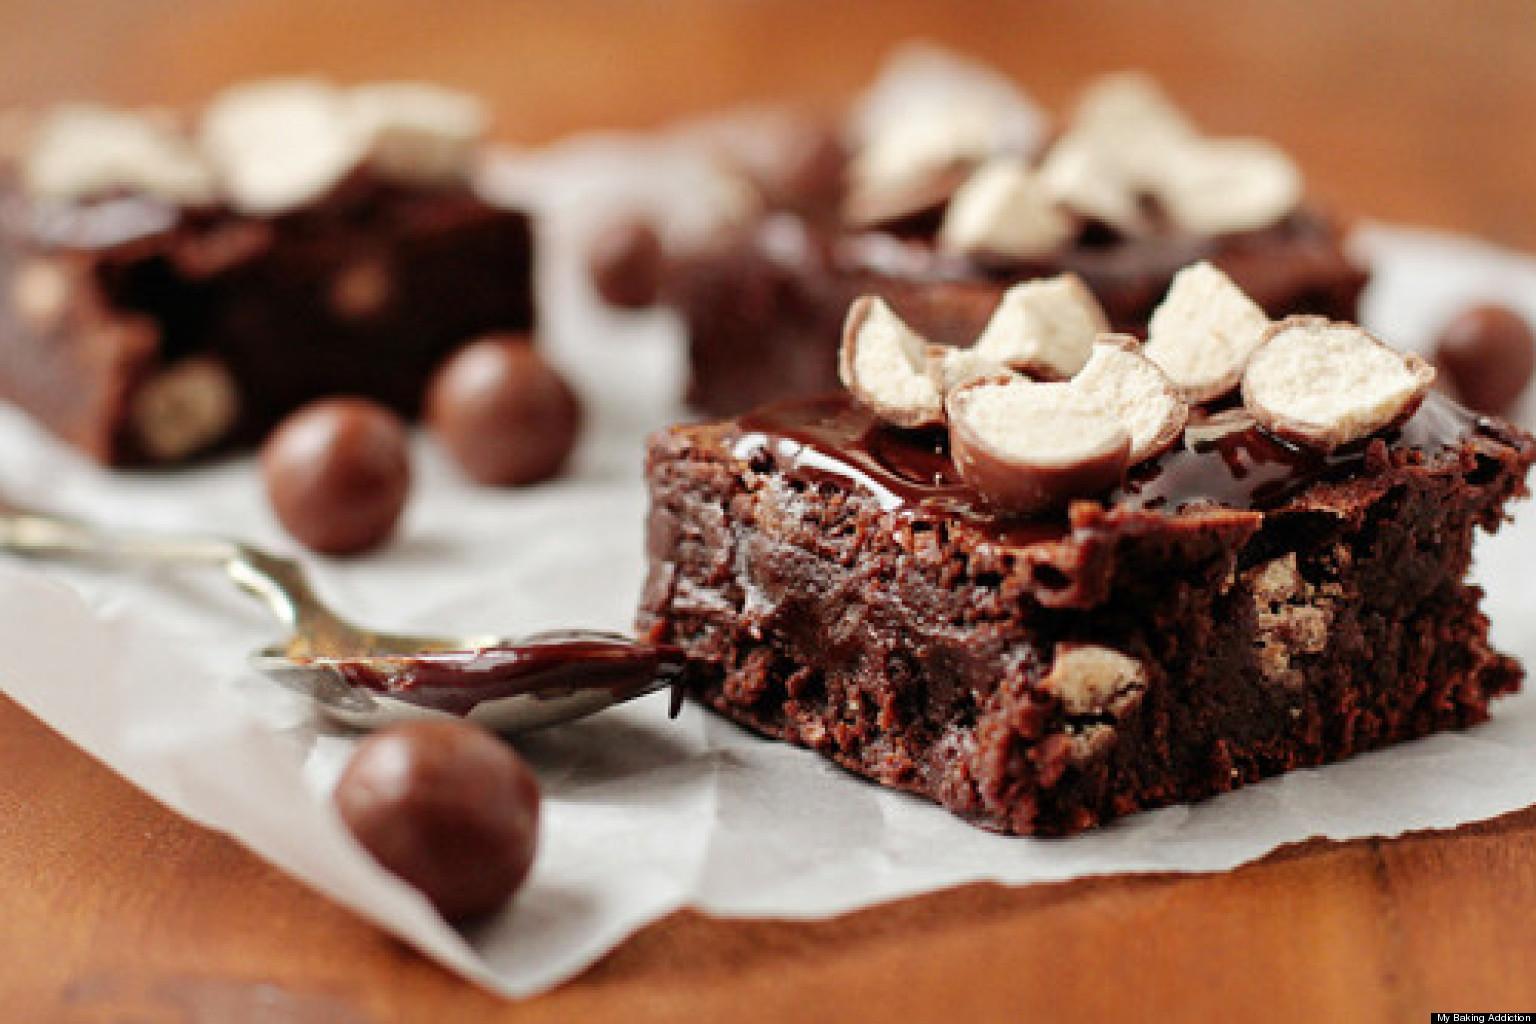 Chocolate Dessert Ideas  Chocolate Malt Ball Dessert Recipes PHOTOS